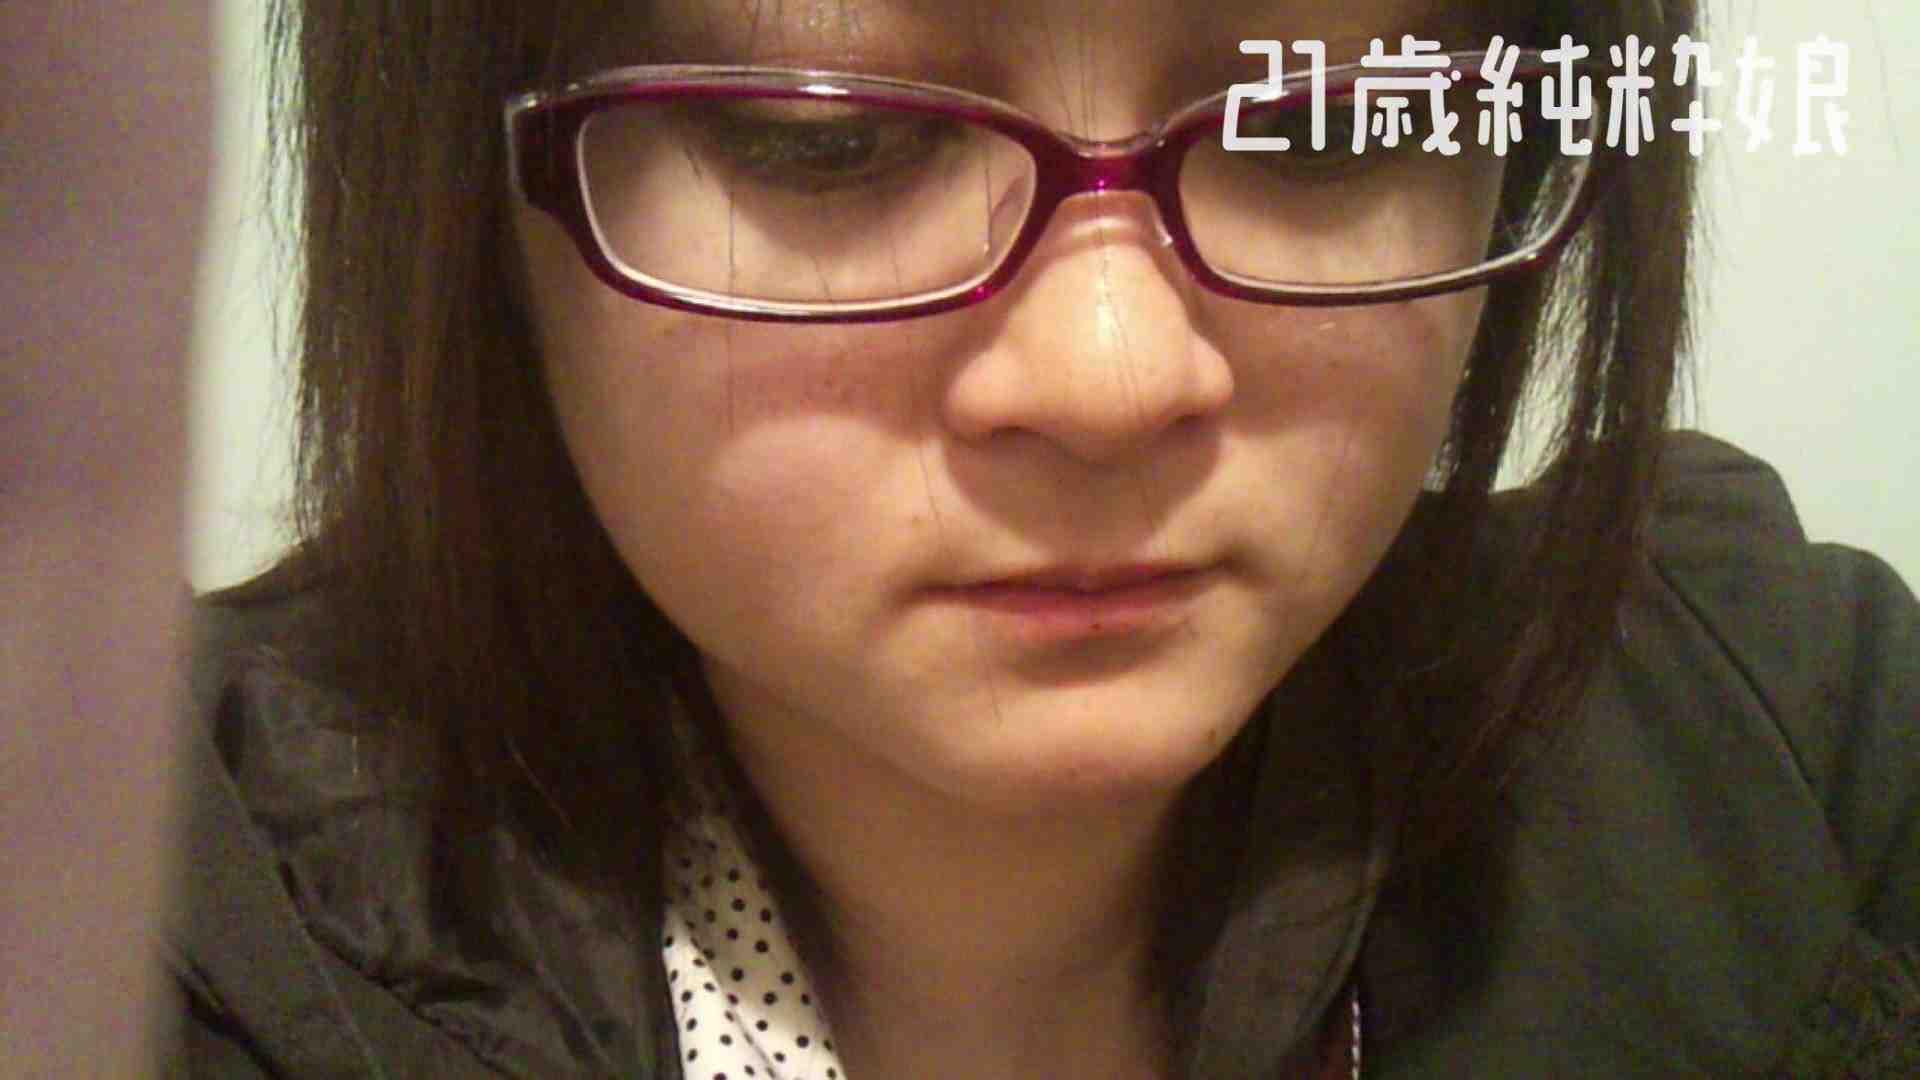 Gカップ21歳純粋嬢第2弾Vol.5 OLヌード天国  110PIX 92